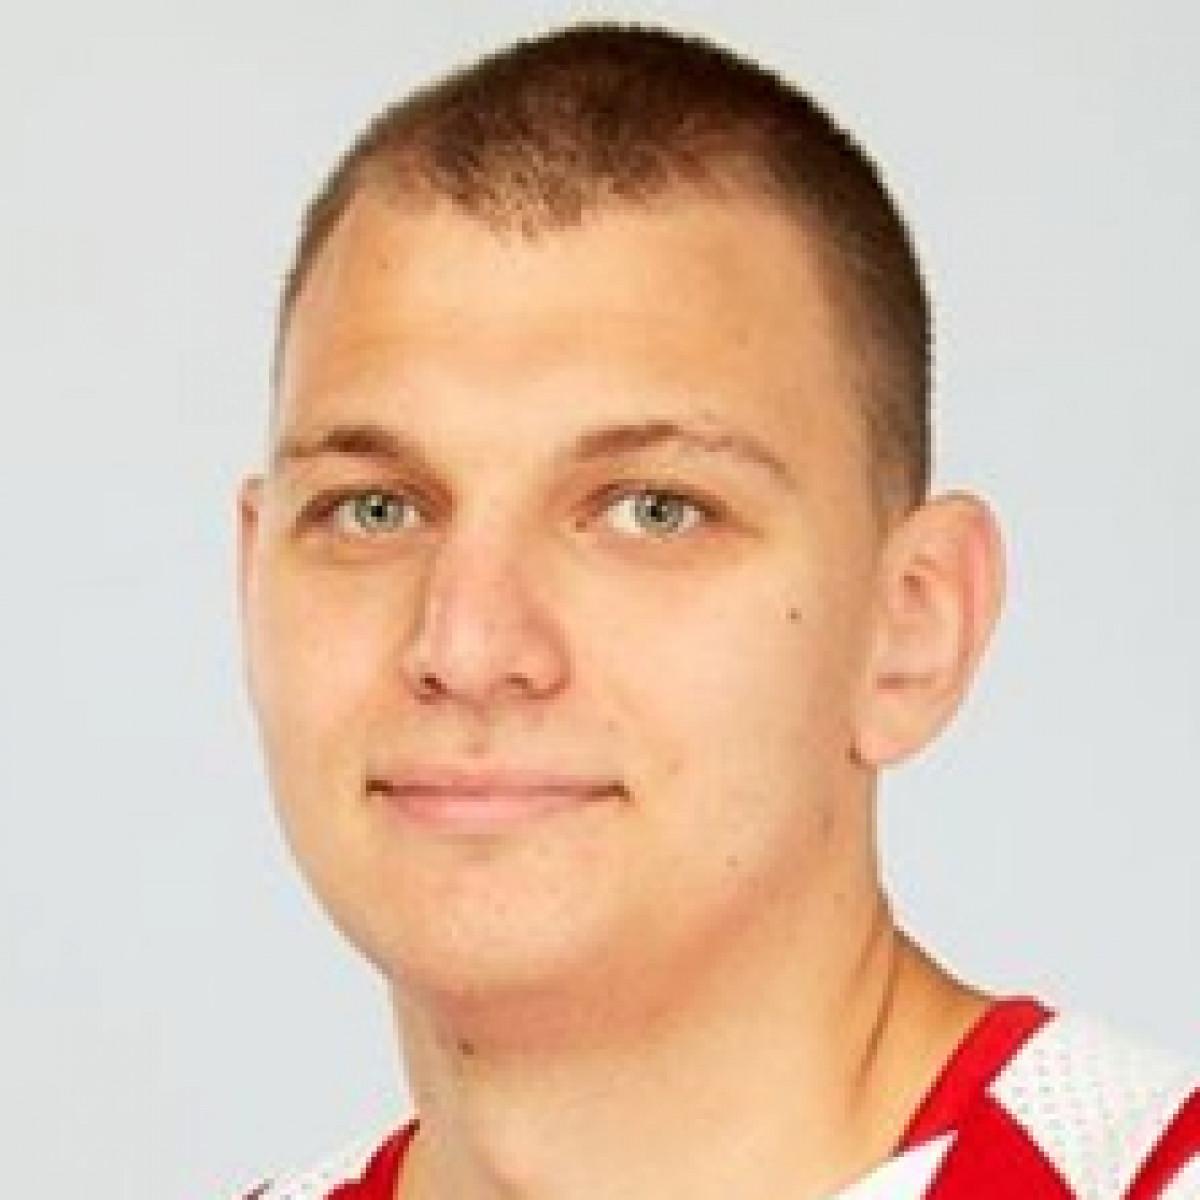 Oleksandr Antypov